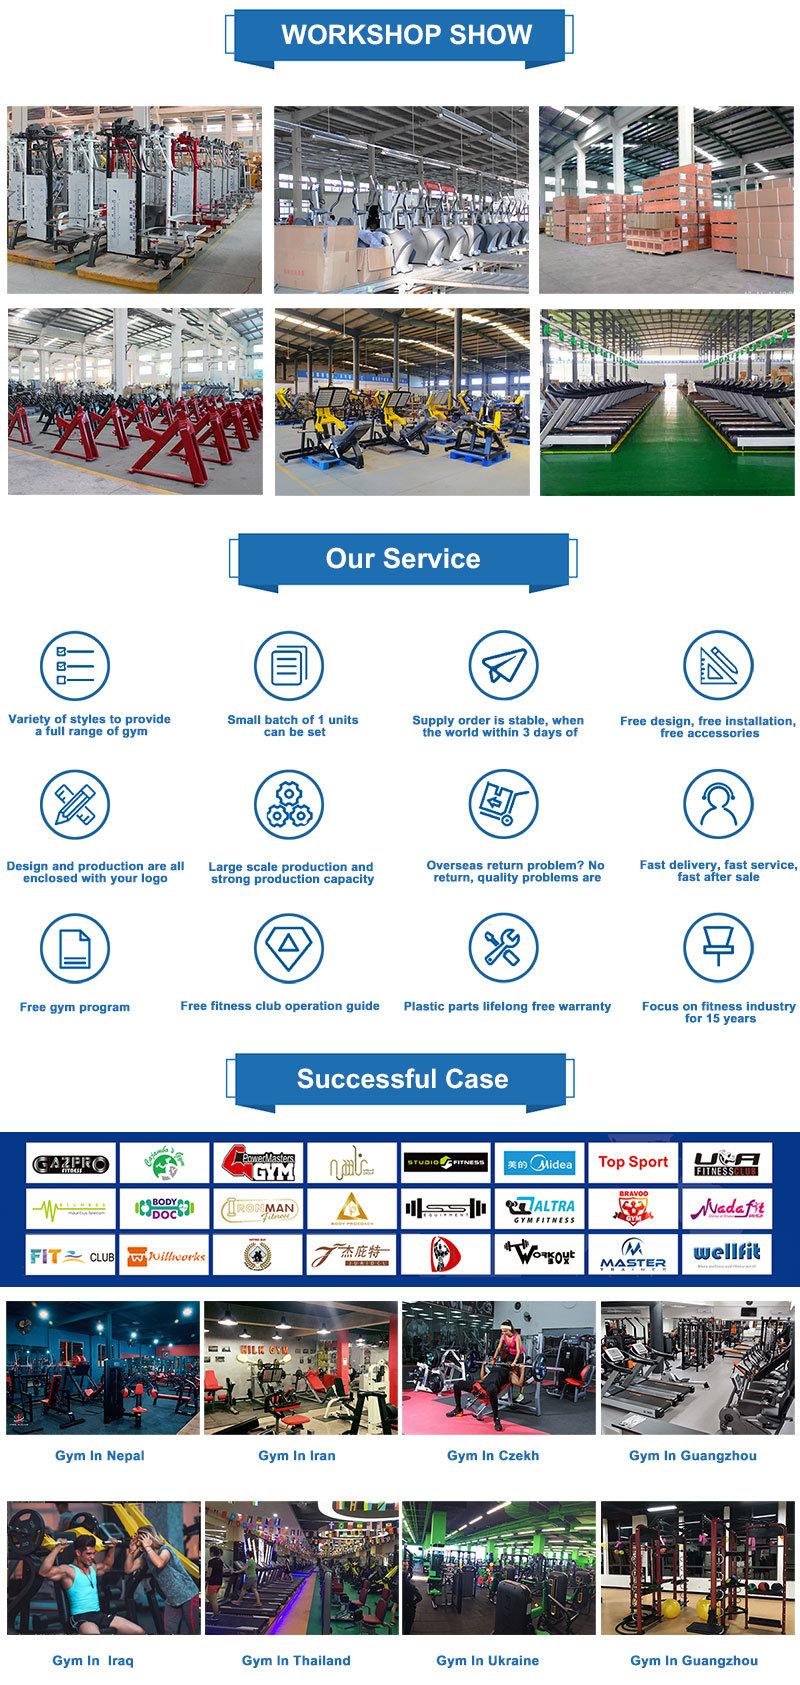 Hammer Strength Pull Down/Plate Loaded Gym Equipment for Wholesaler (BFT-1002)